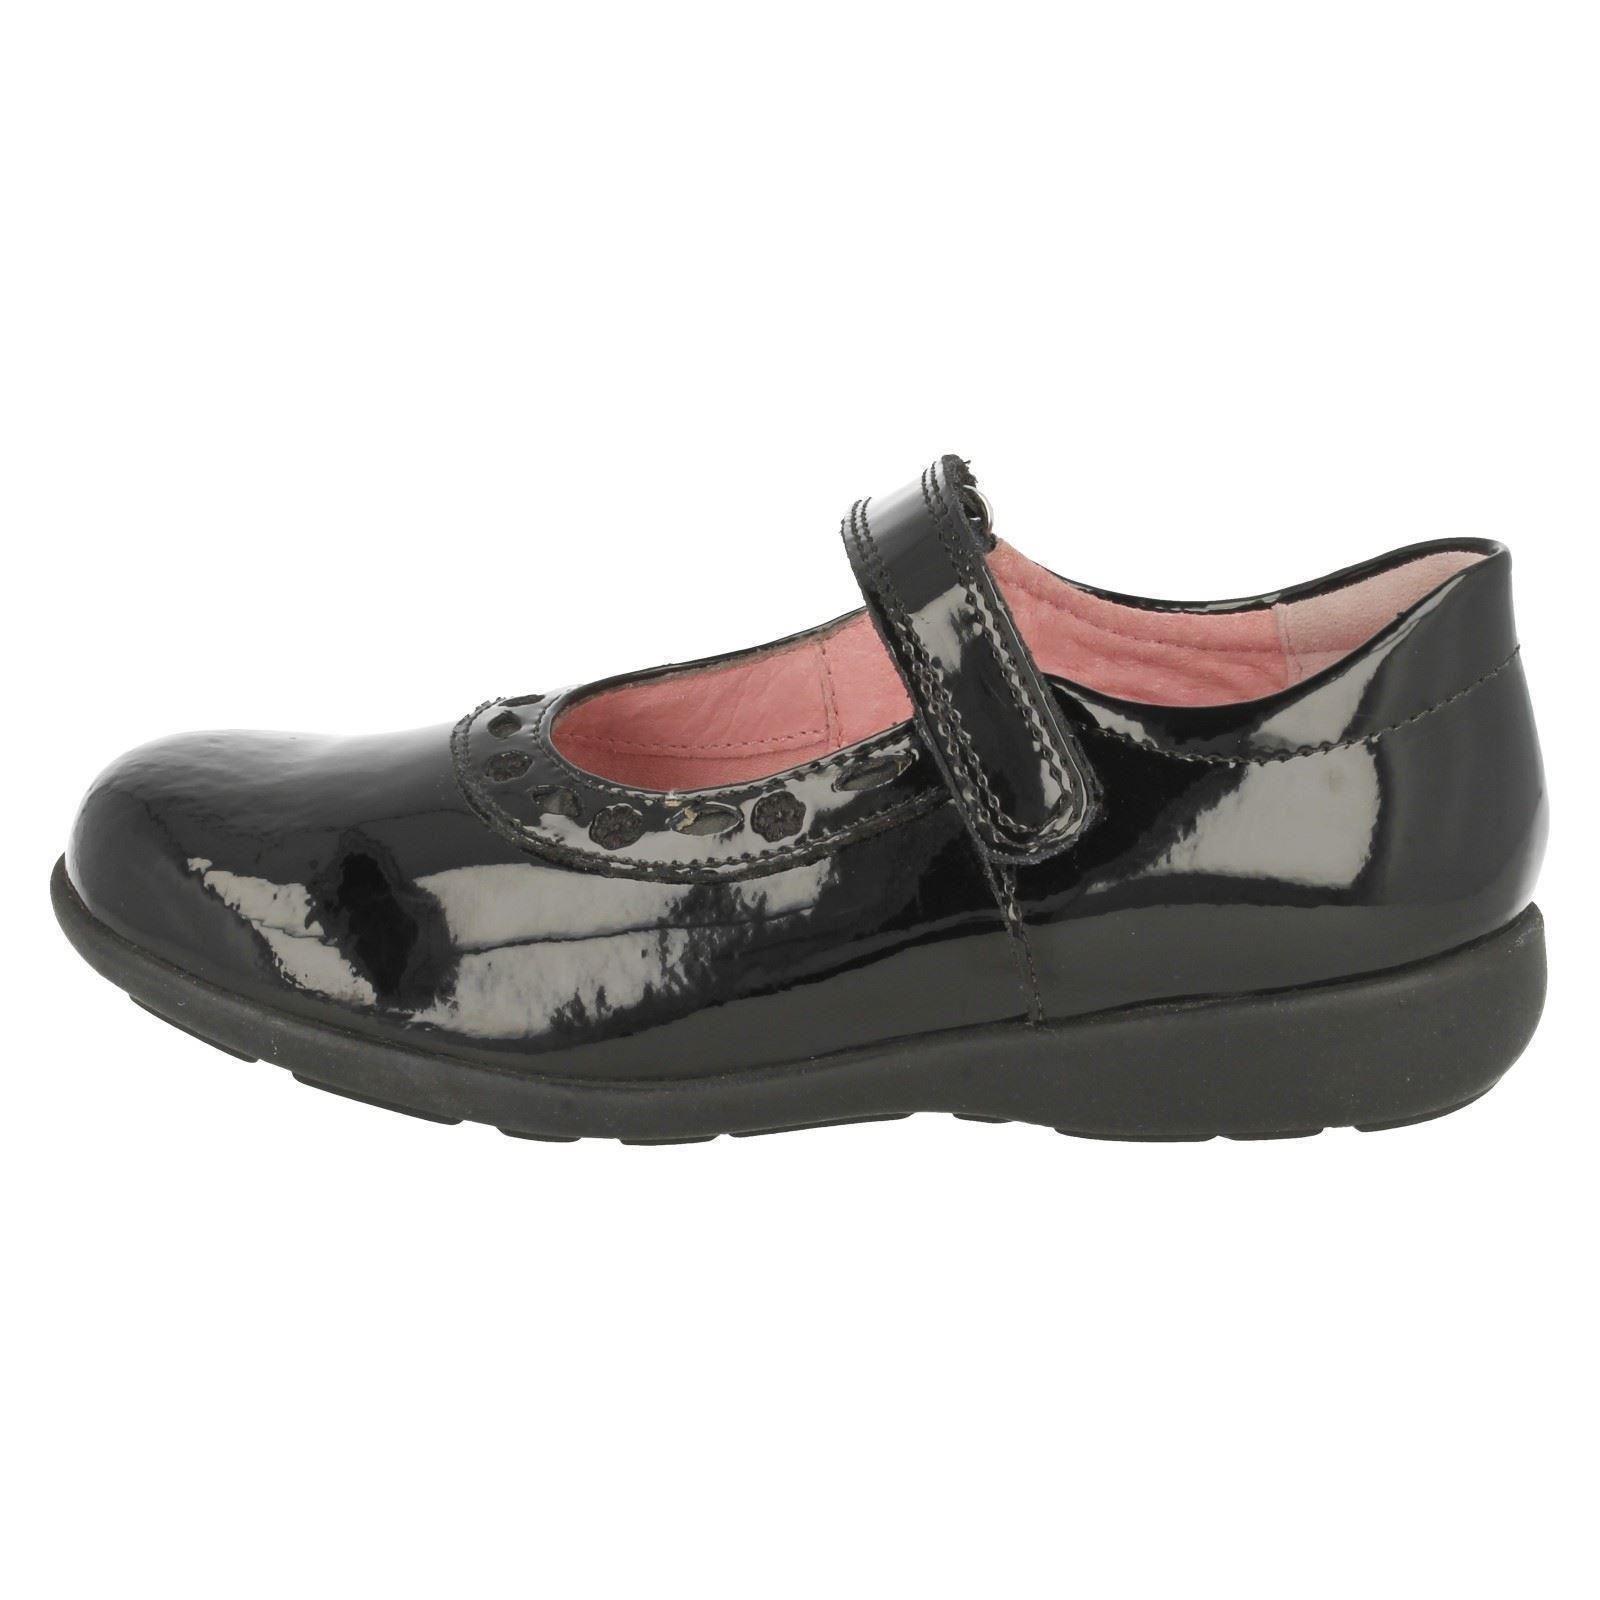 Chicas START Rite Mary Jane Zapatos Escolares, Tijeras De Etiqueta-W